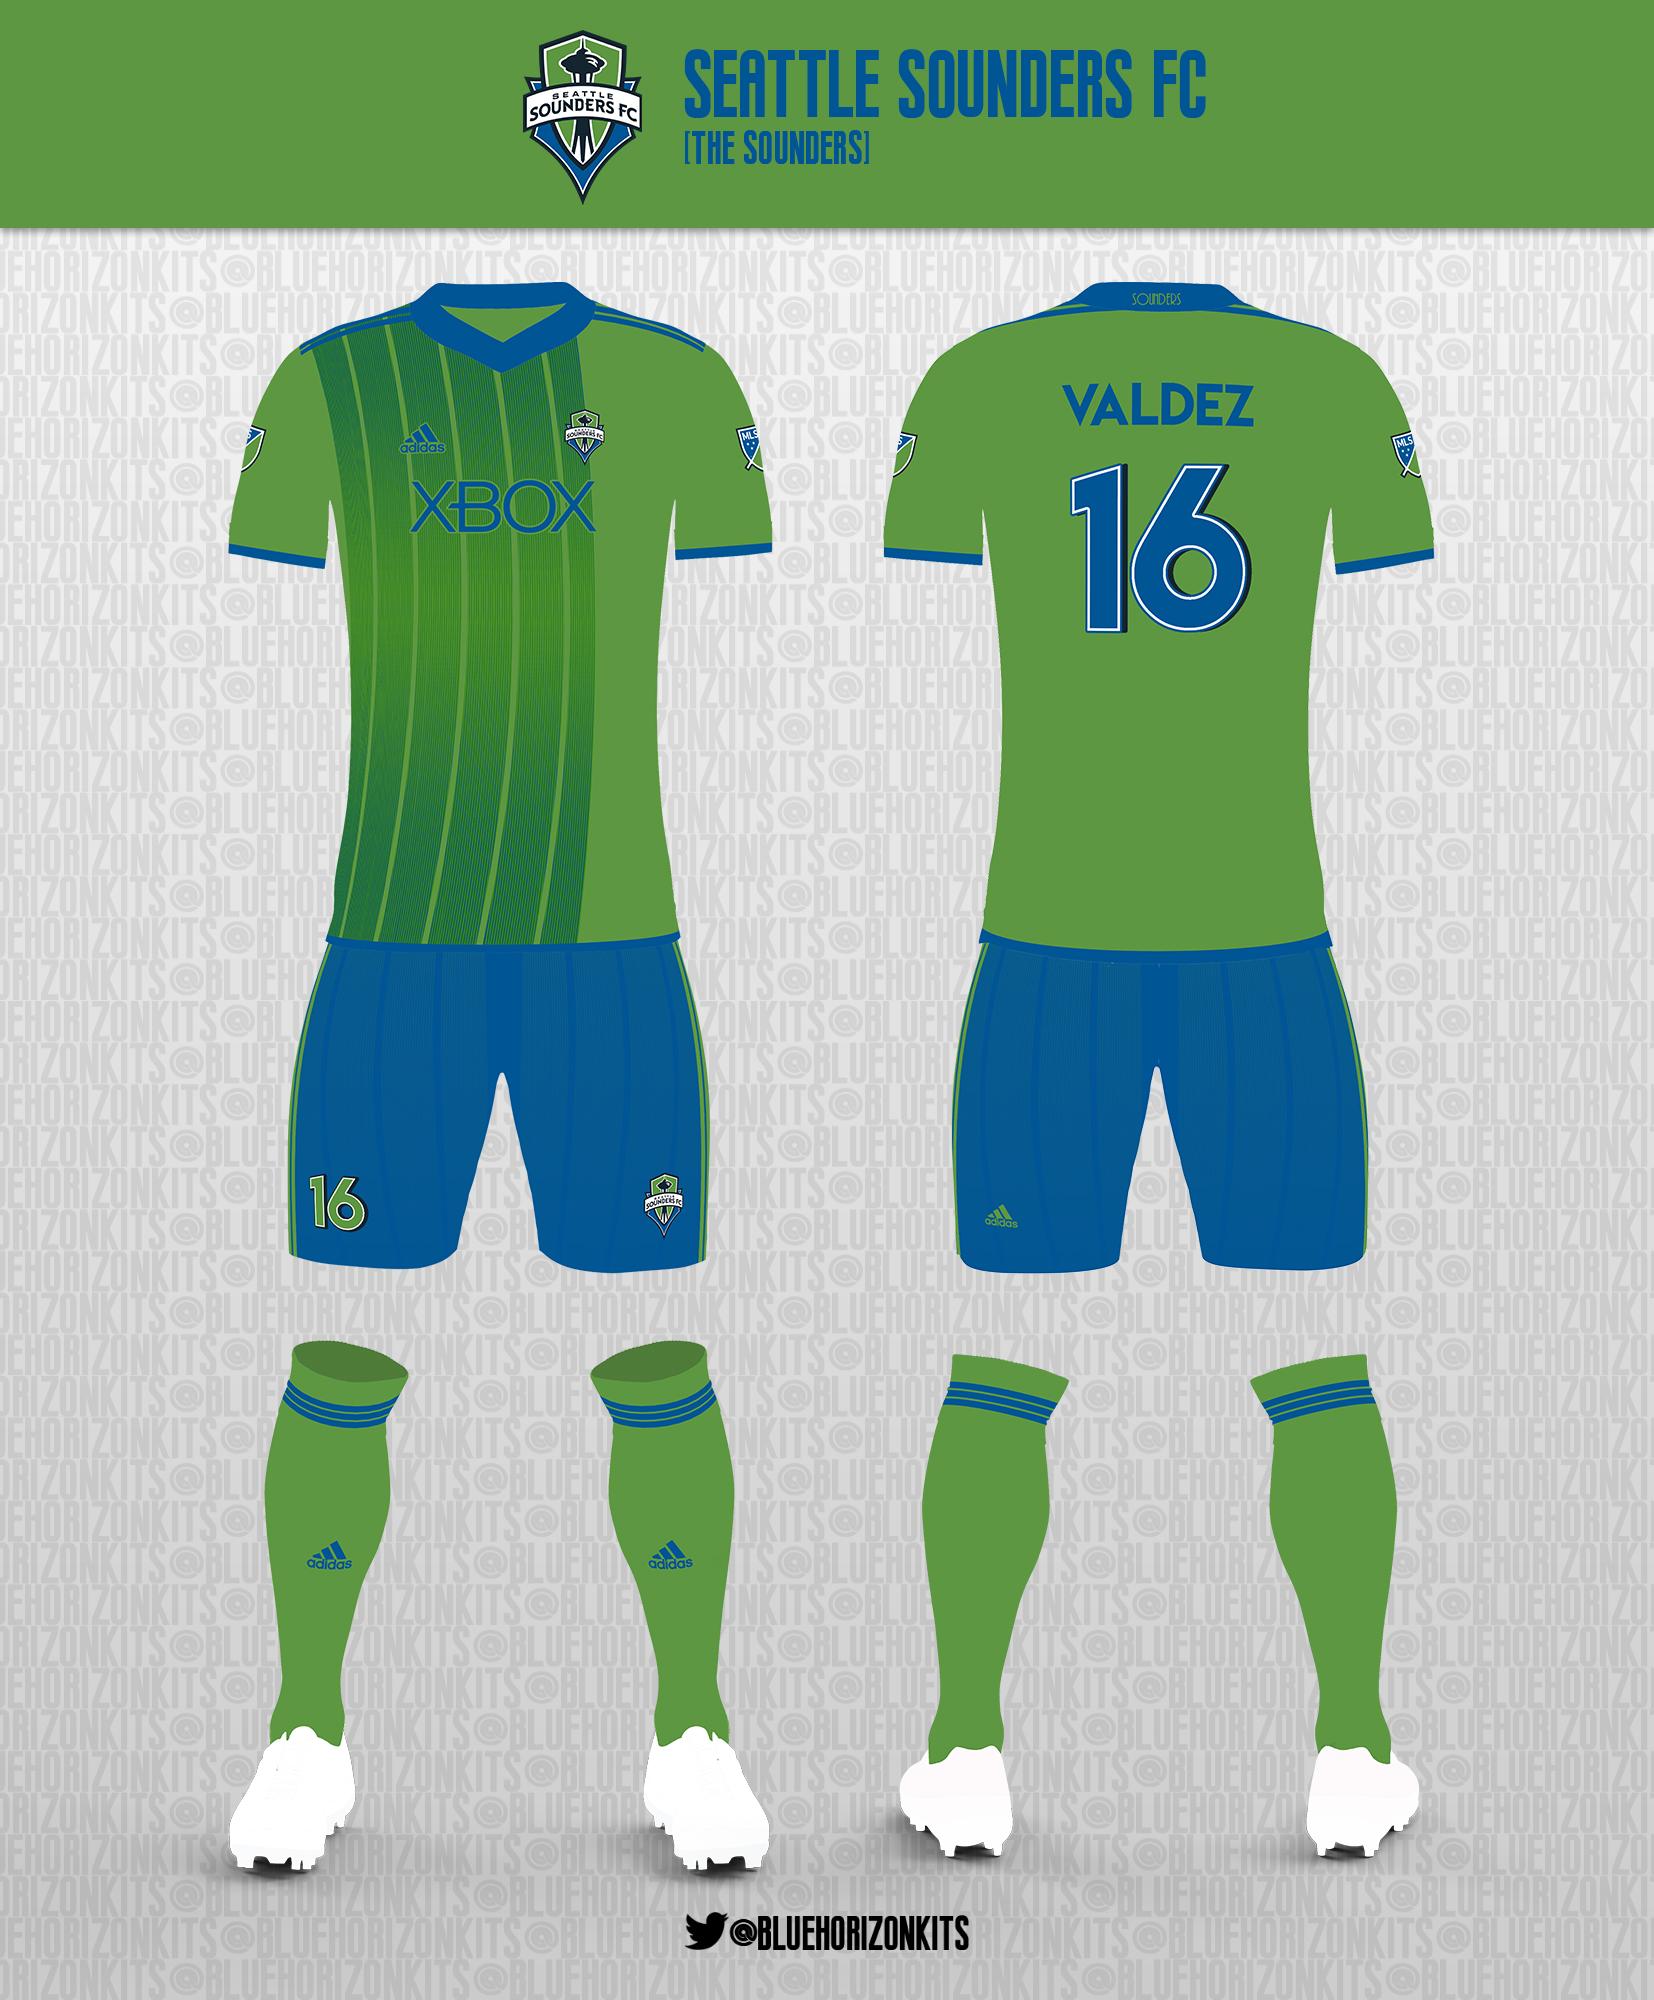 online store 0d798 853e9 Seattle Sounders Home Kit